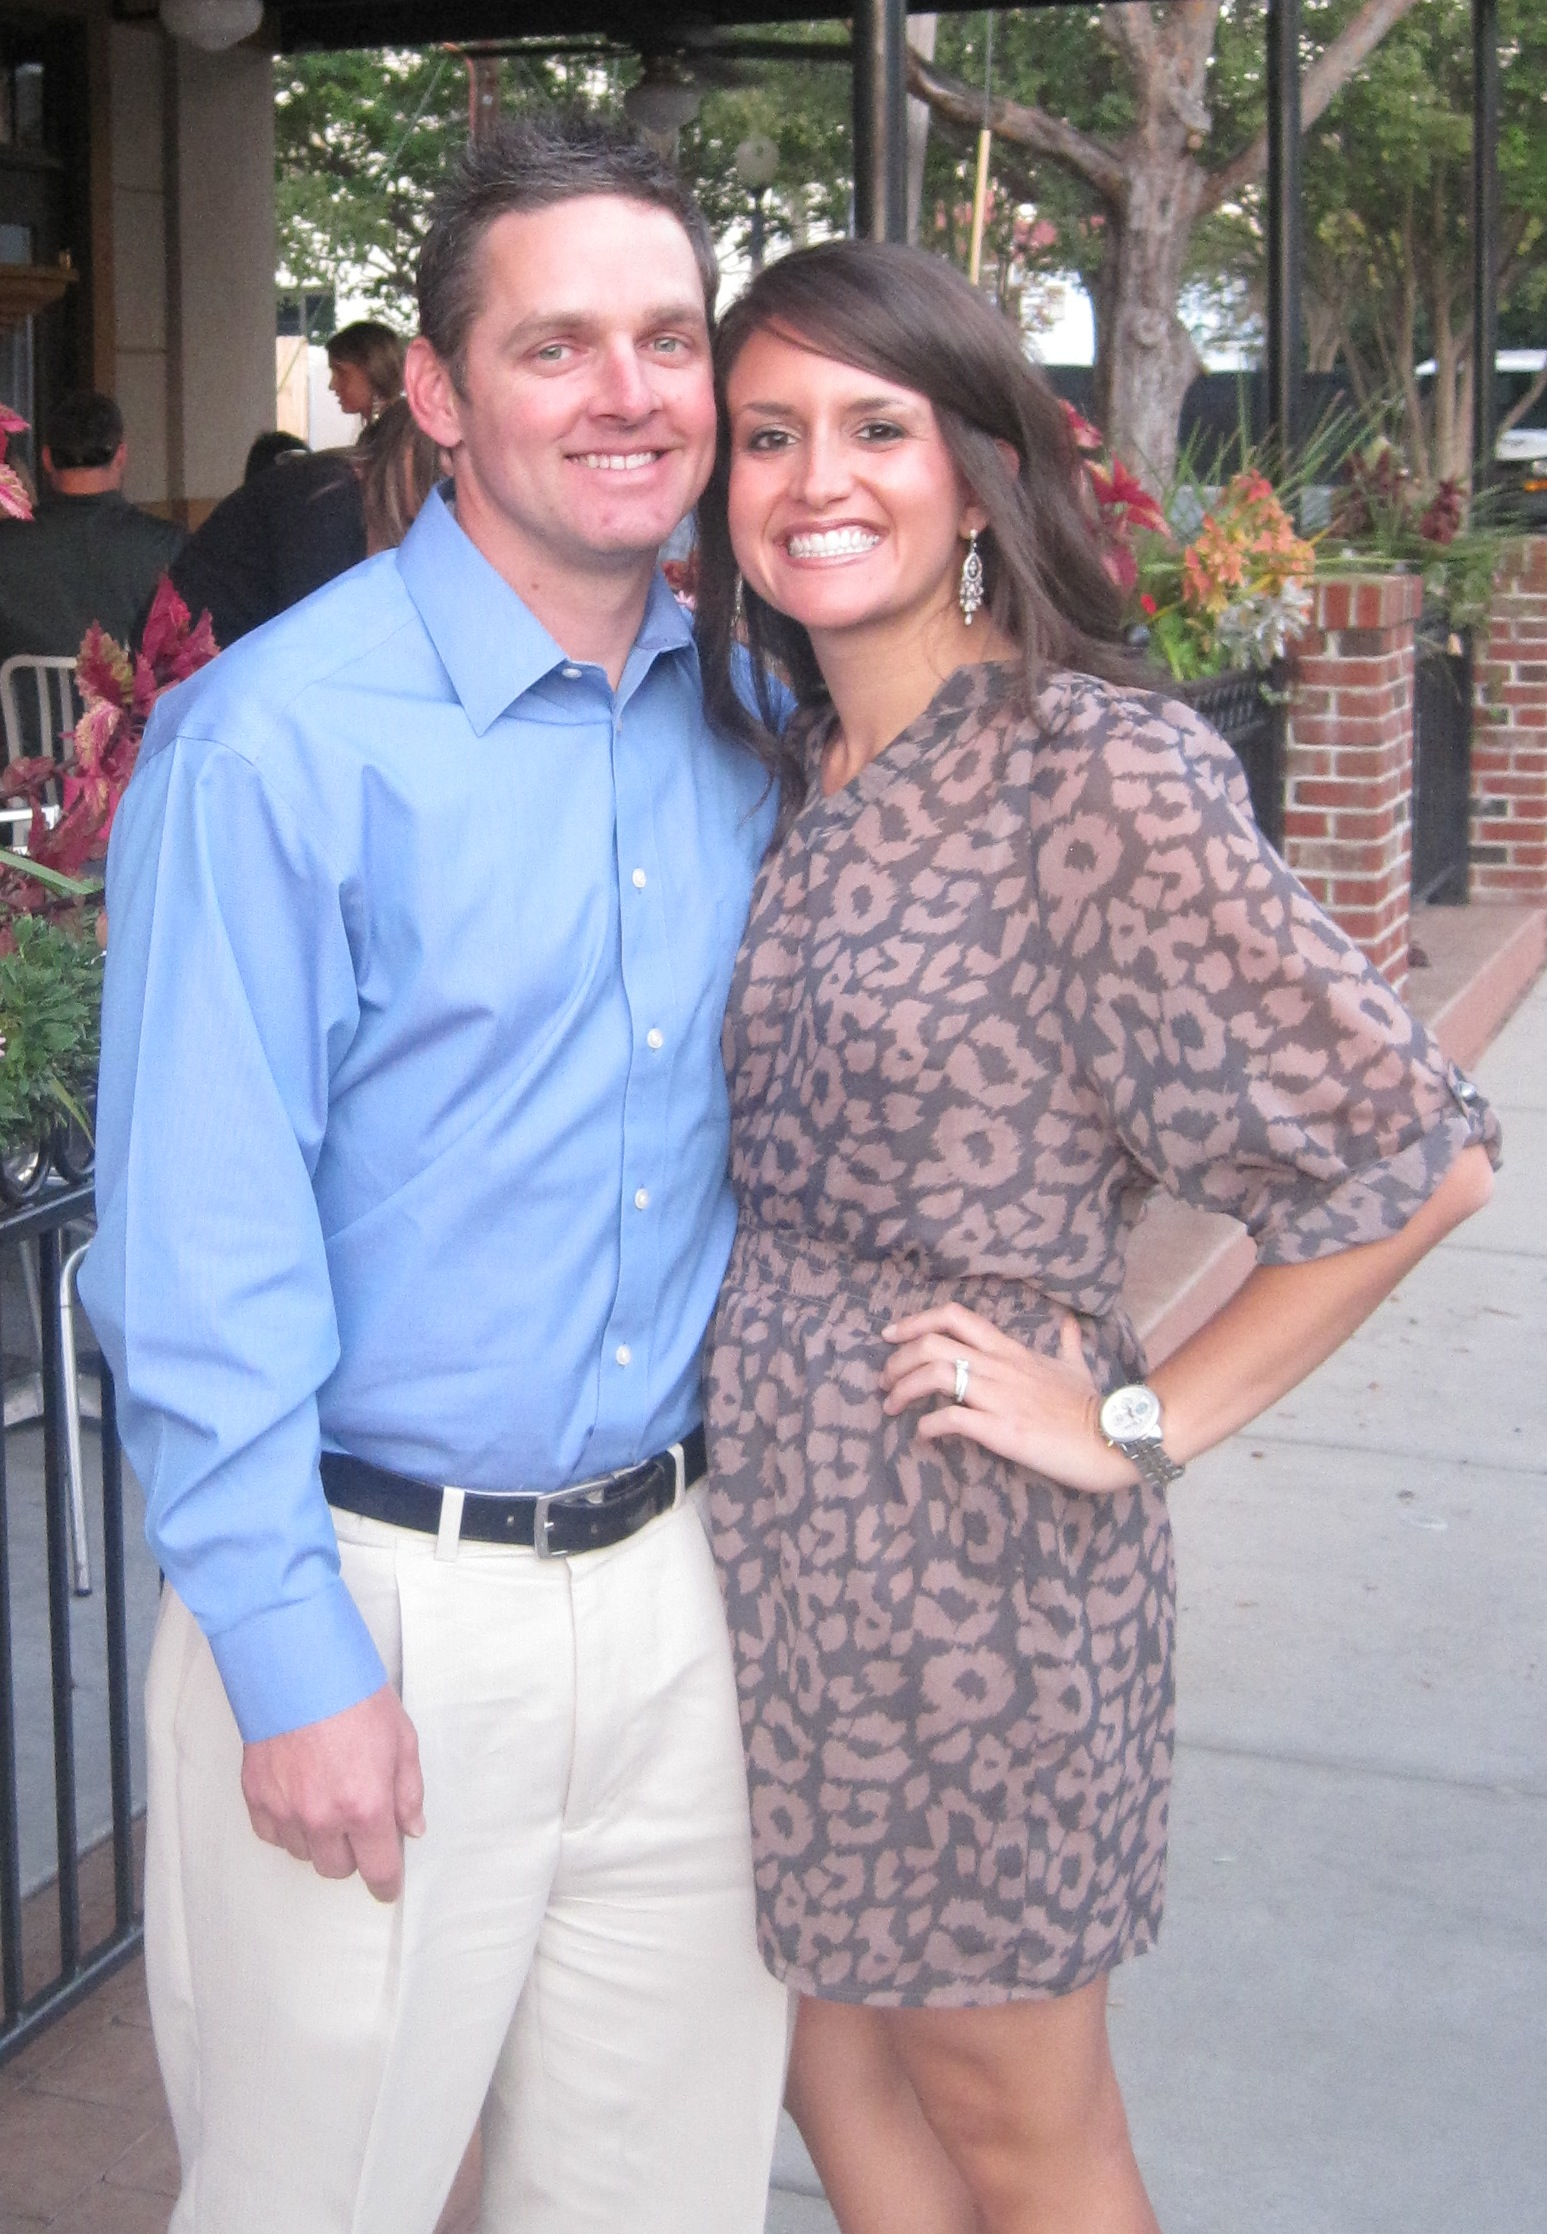 Image 1 of Nina and Mark